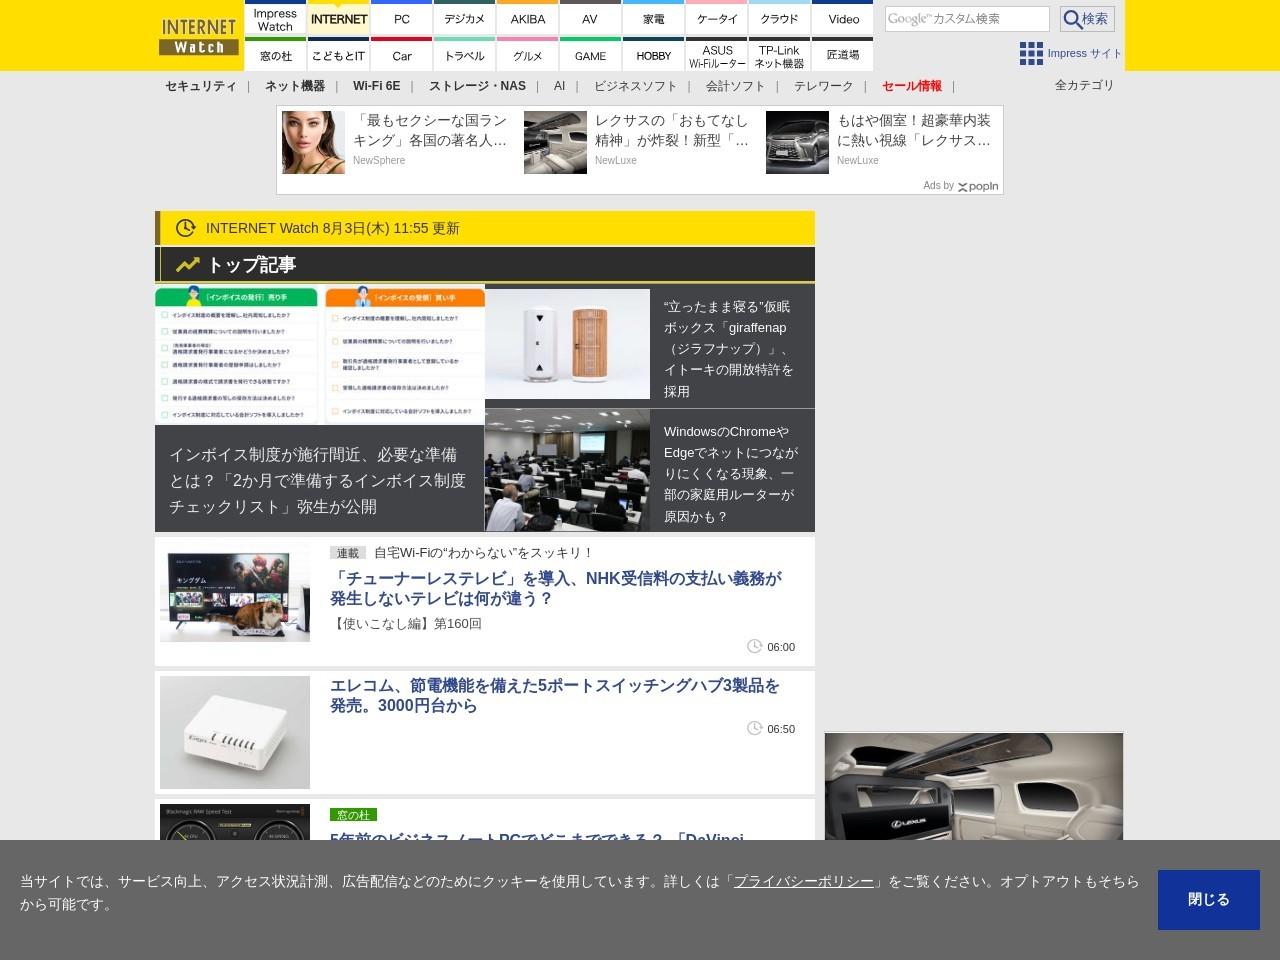 https://internet.watch.impress.co.jp/docs/news/1269942.htmlのプレビュー画像